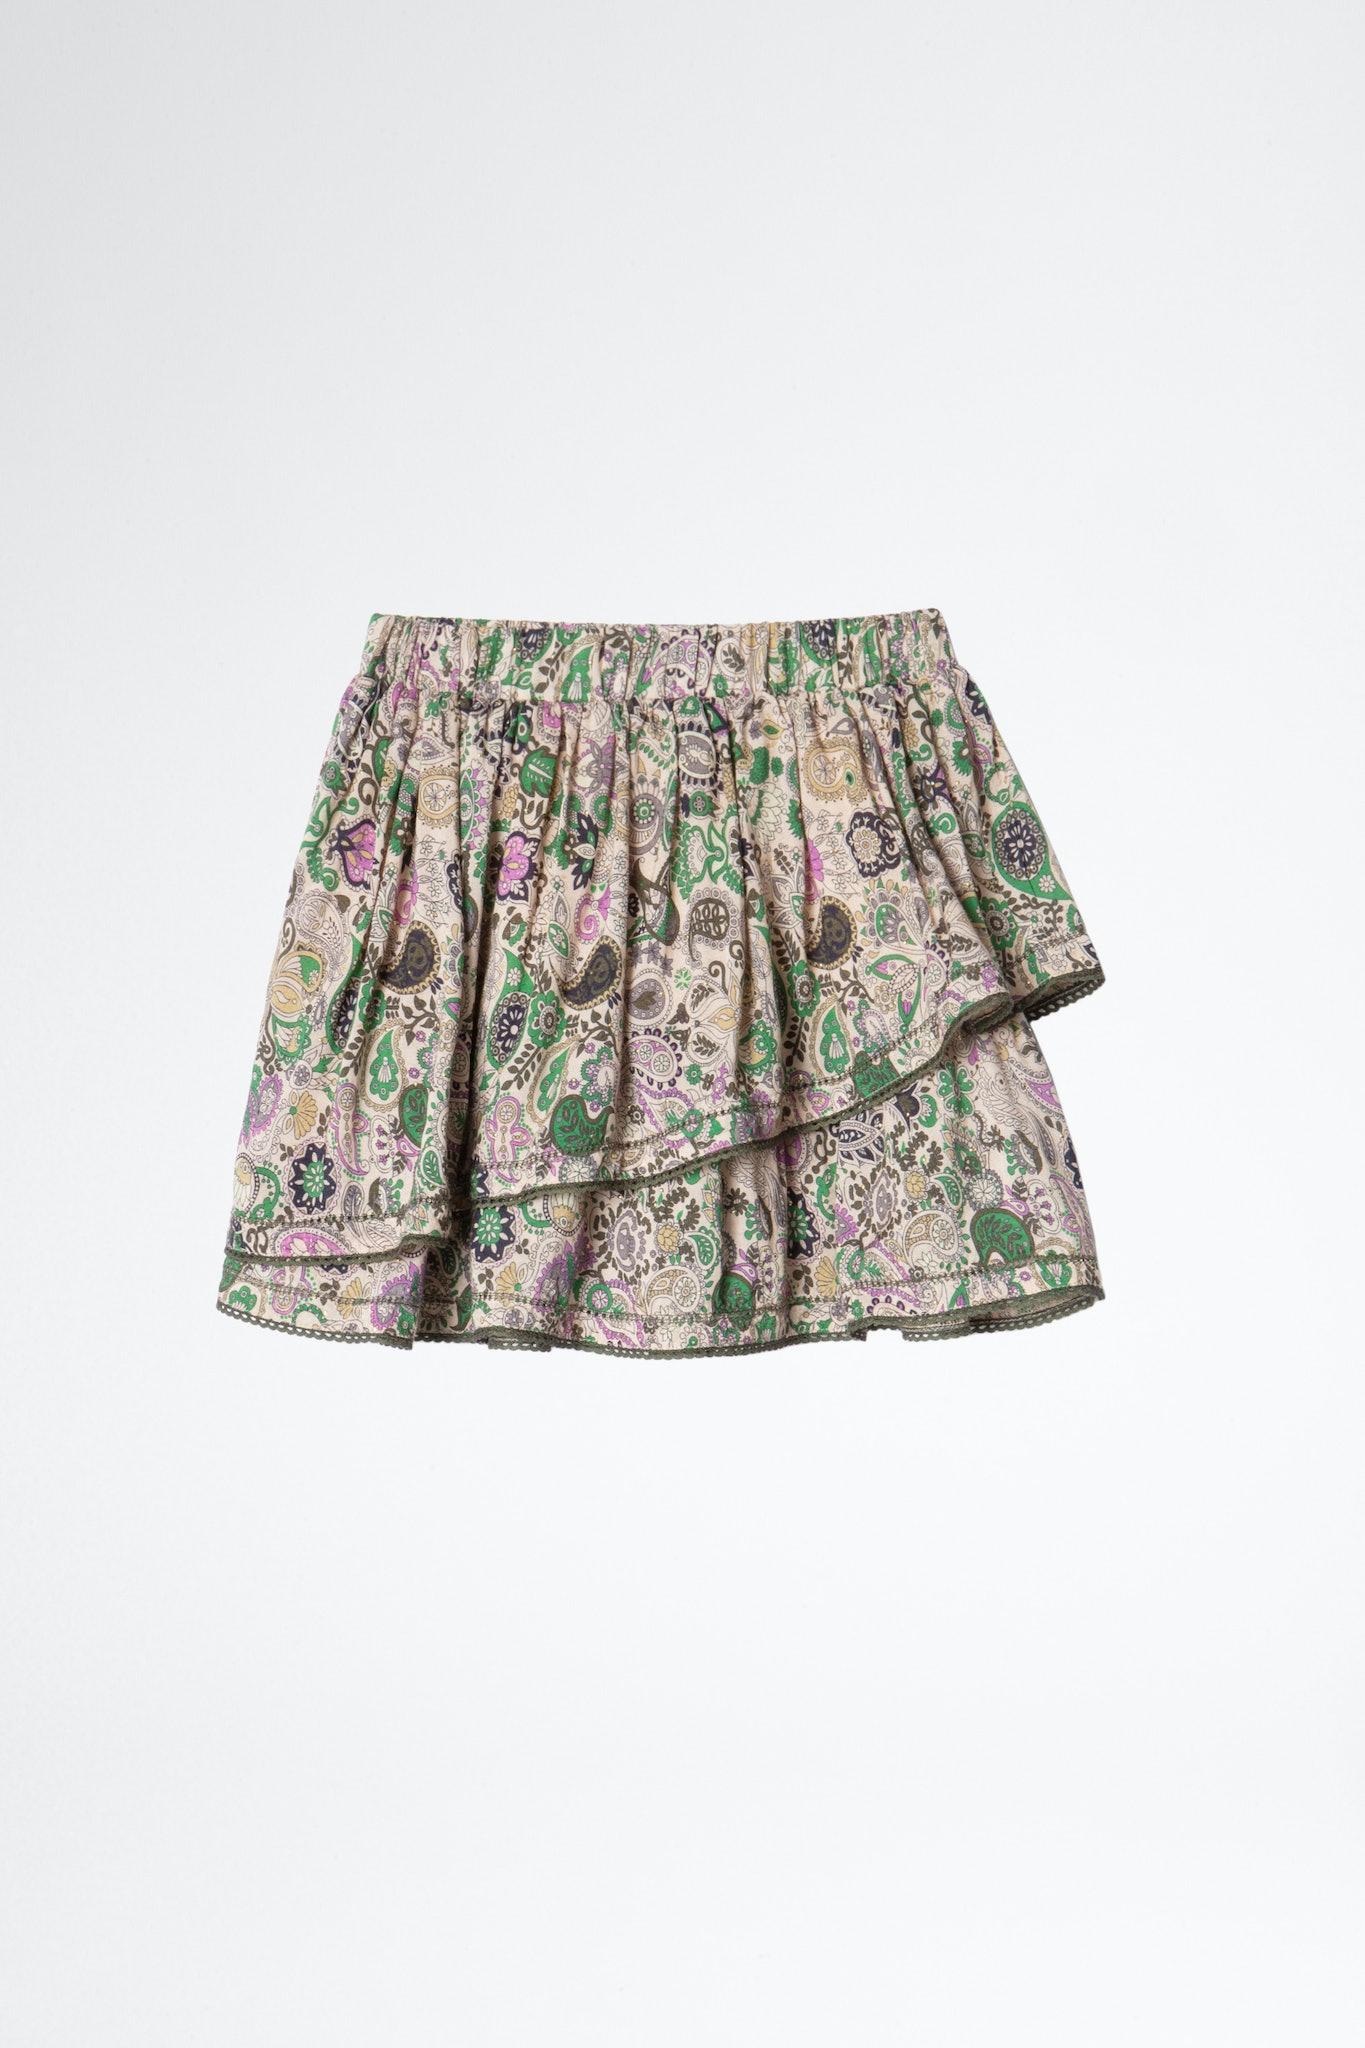 Child's Alexa Skirt